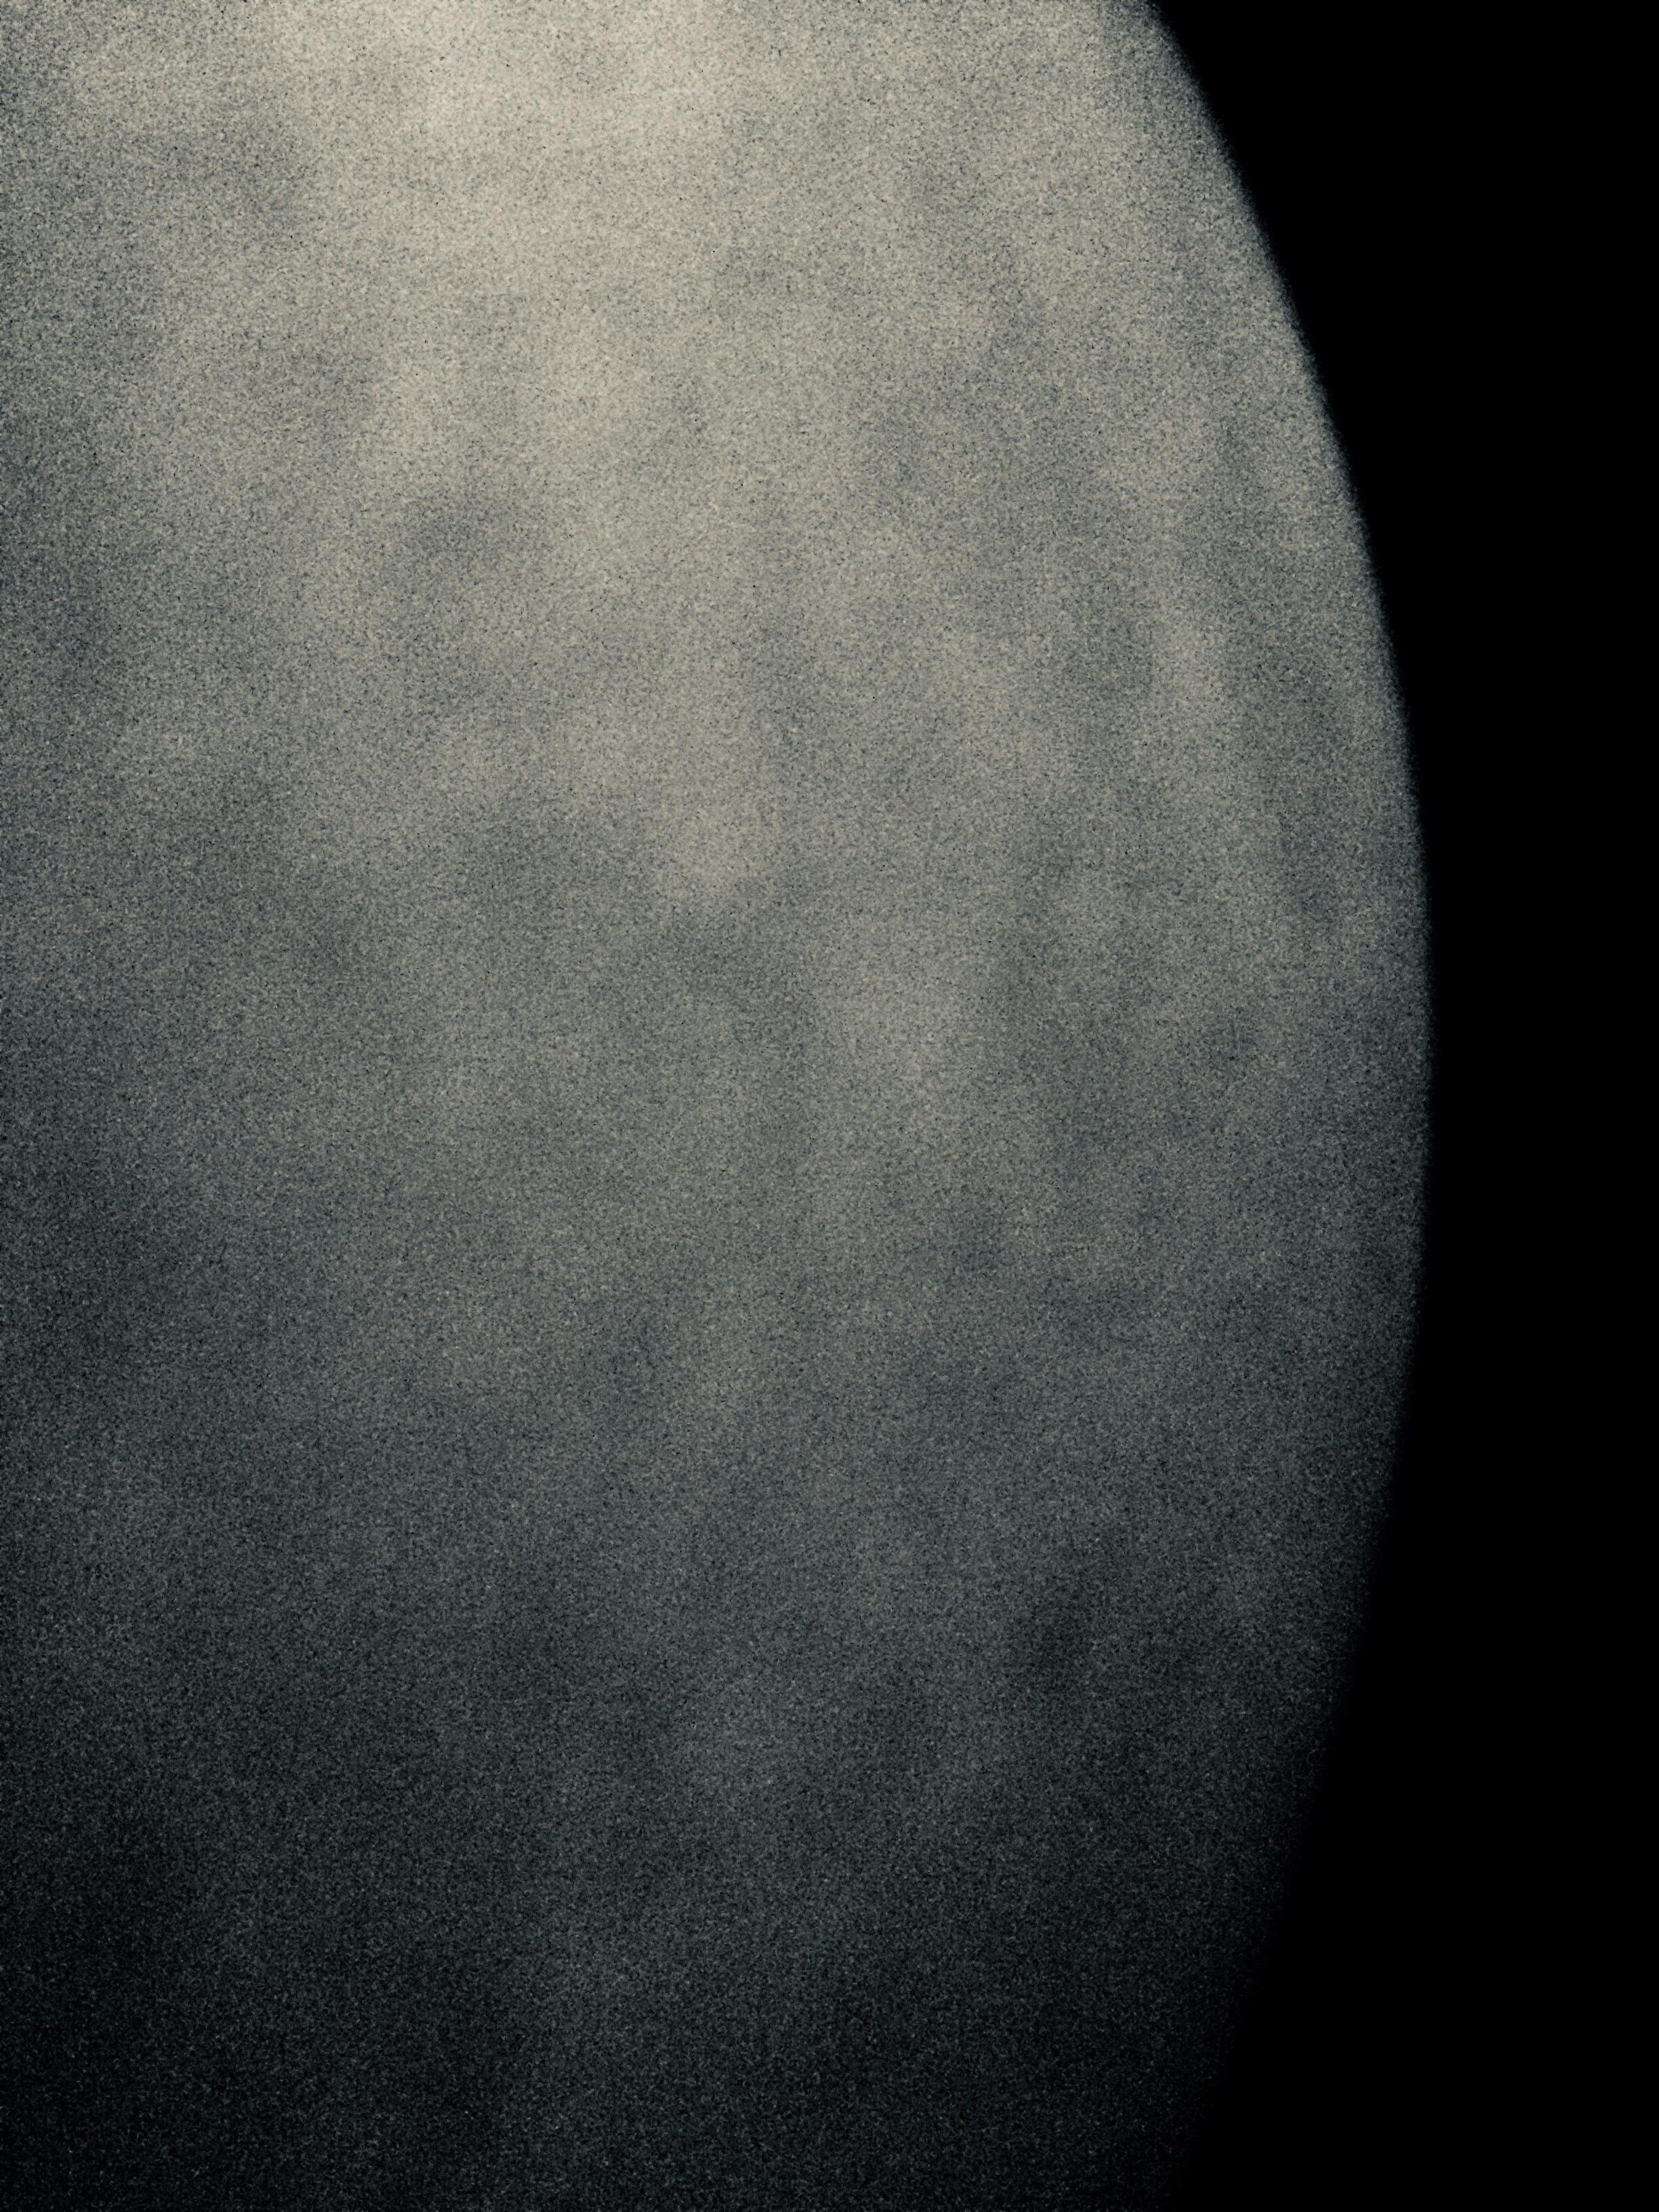 Navel moon3.png